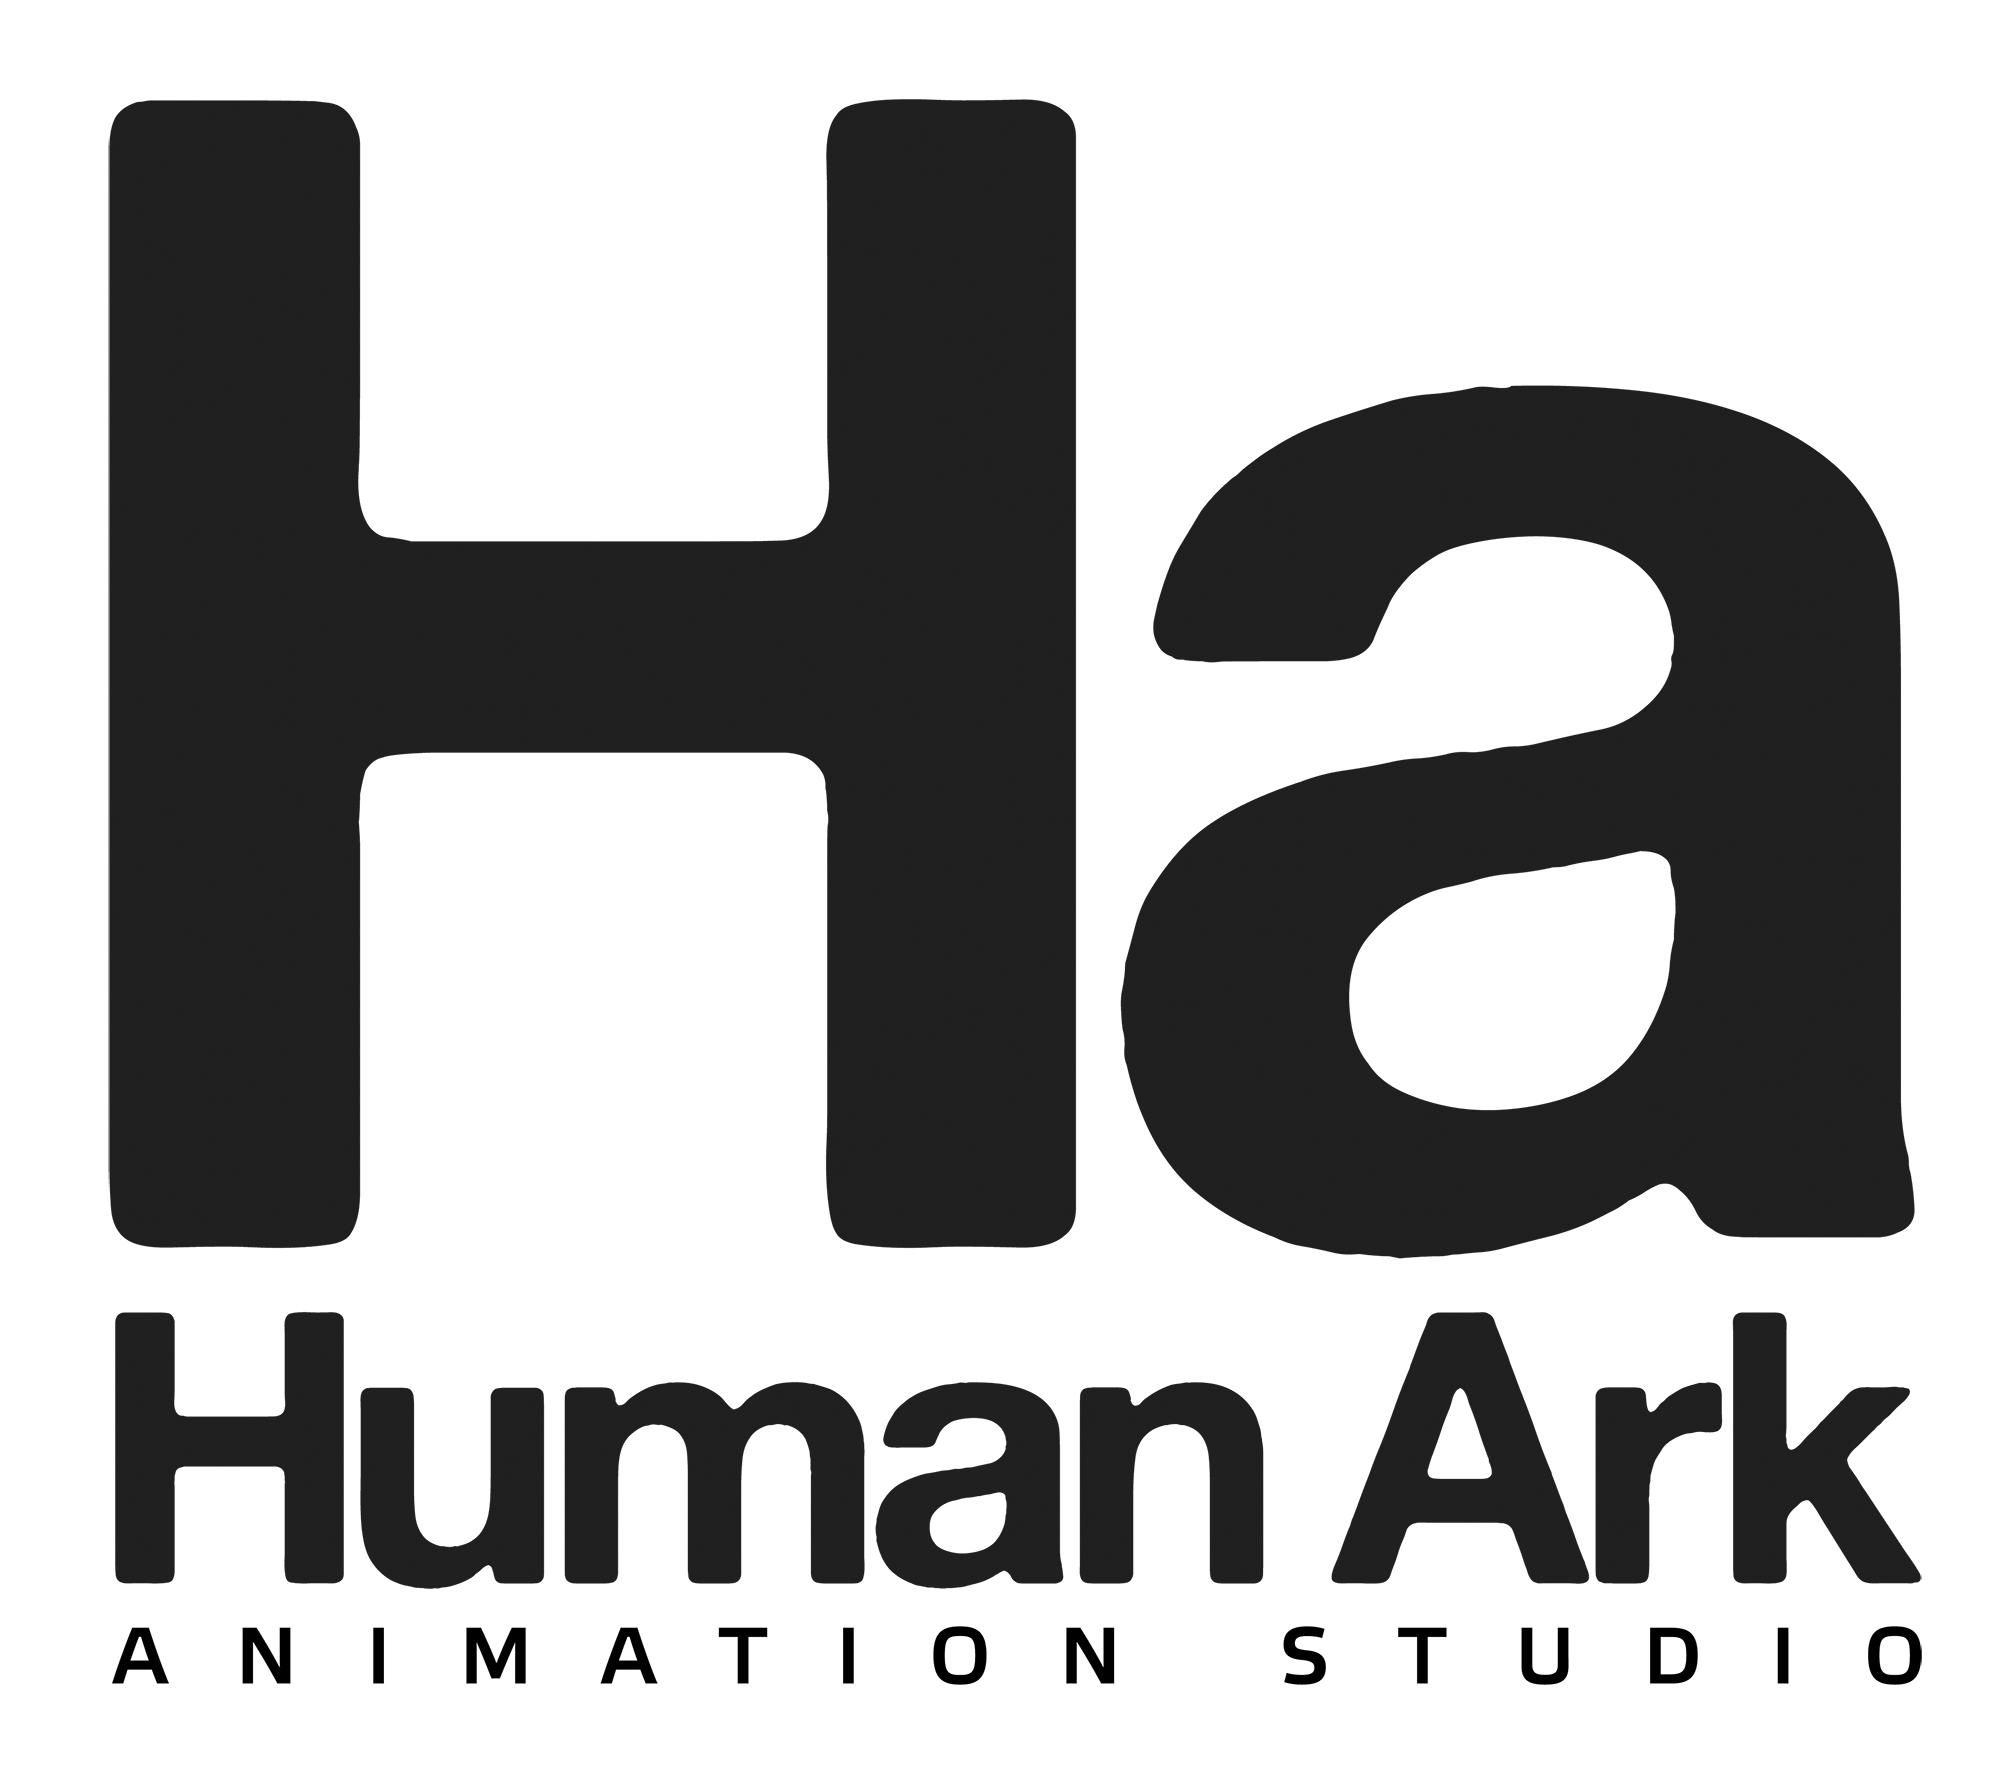 Human Ark